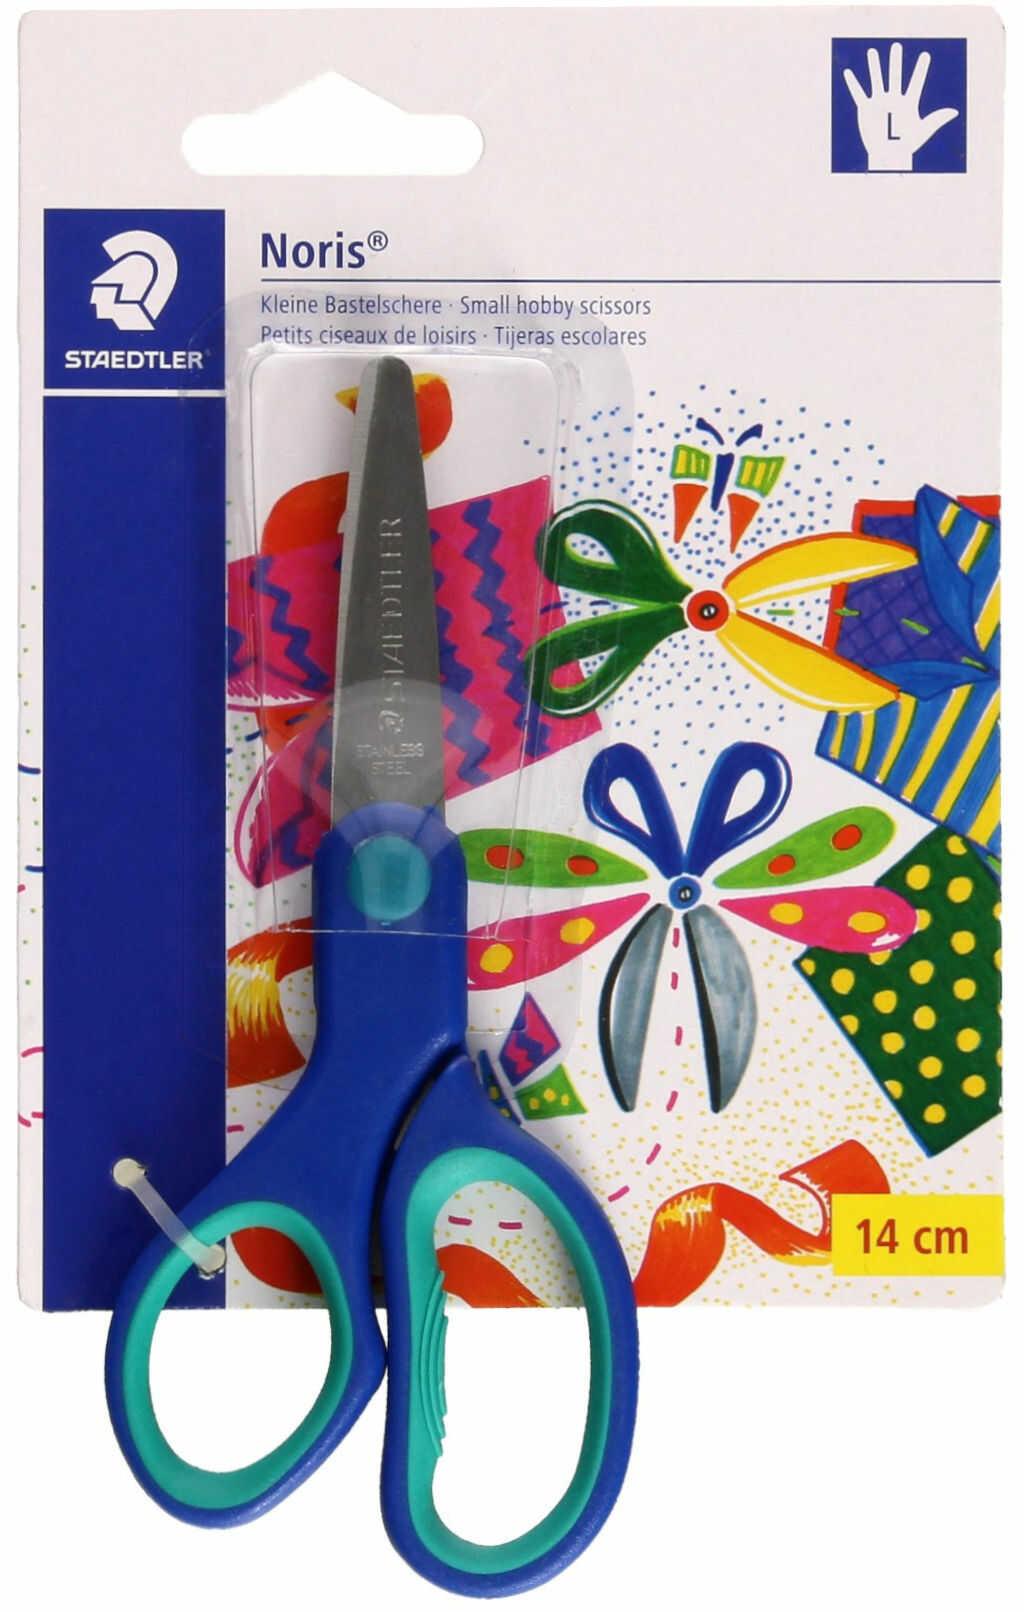 Nożyczki 14cm leworęczne Staedtler S965